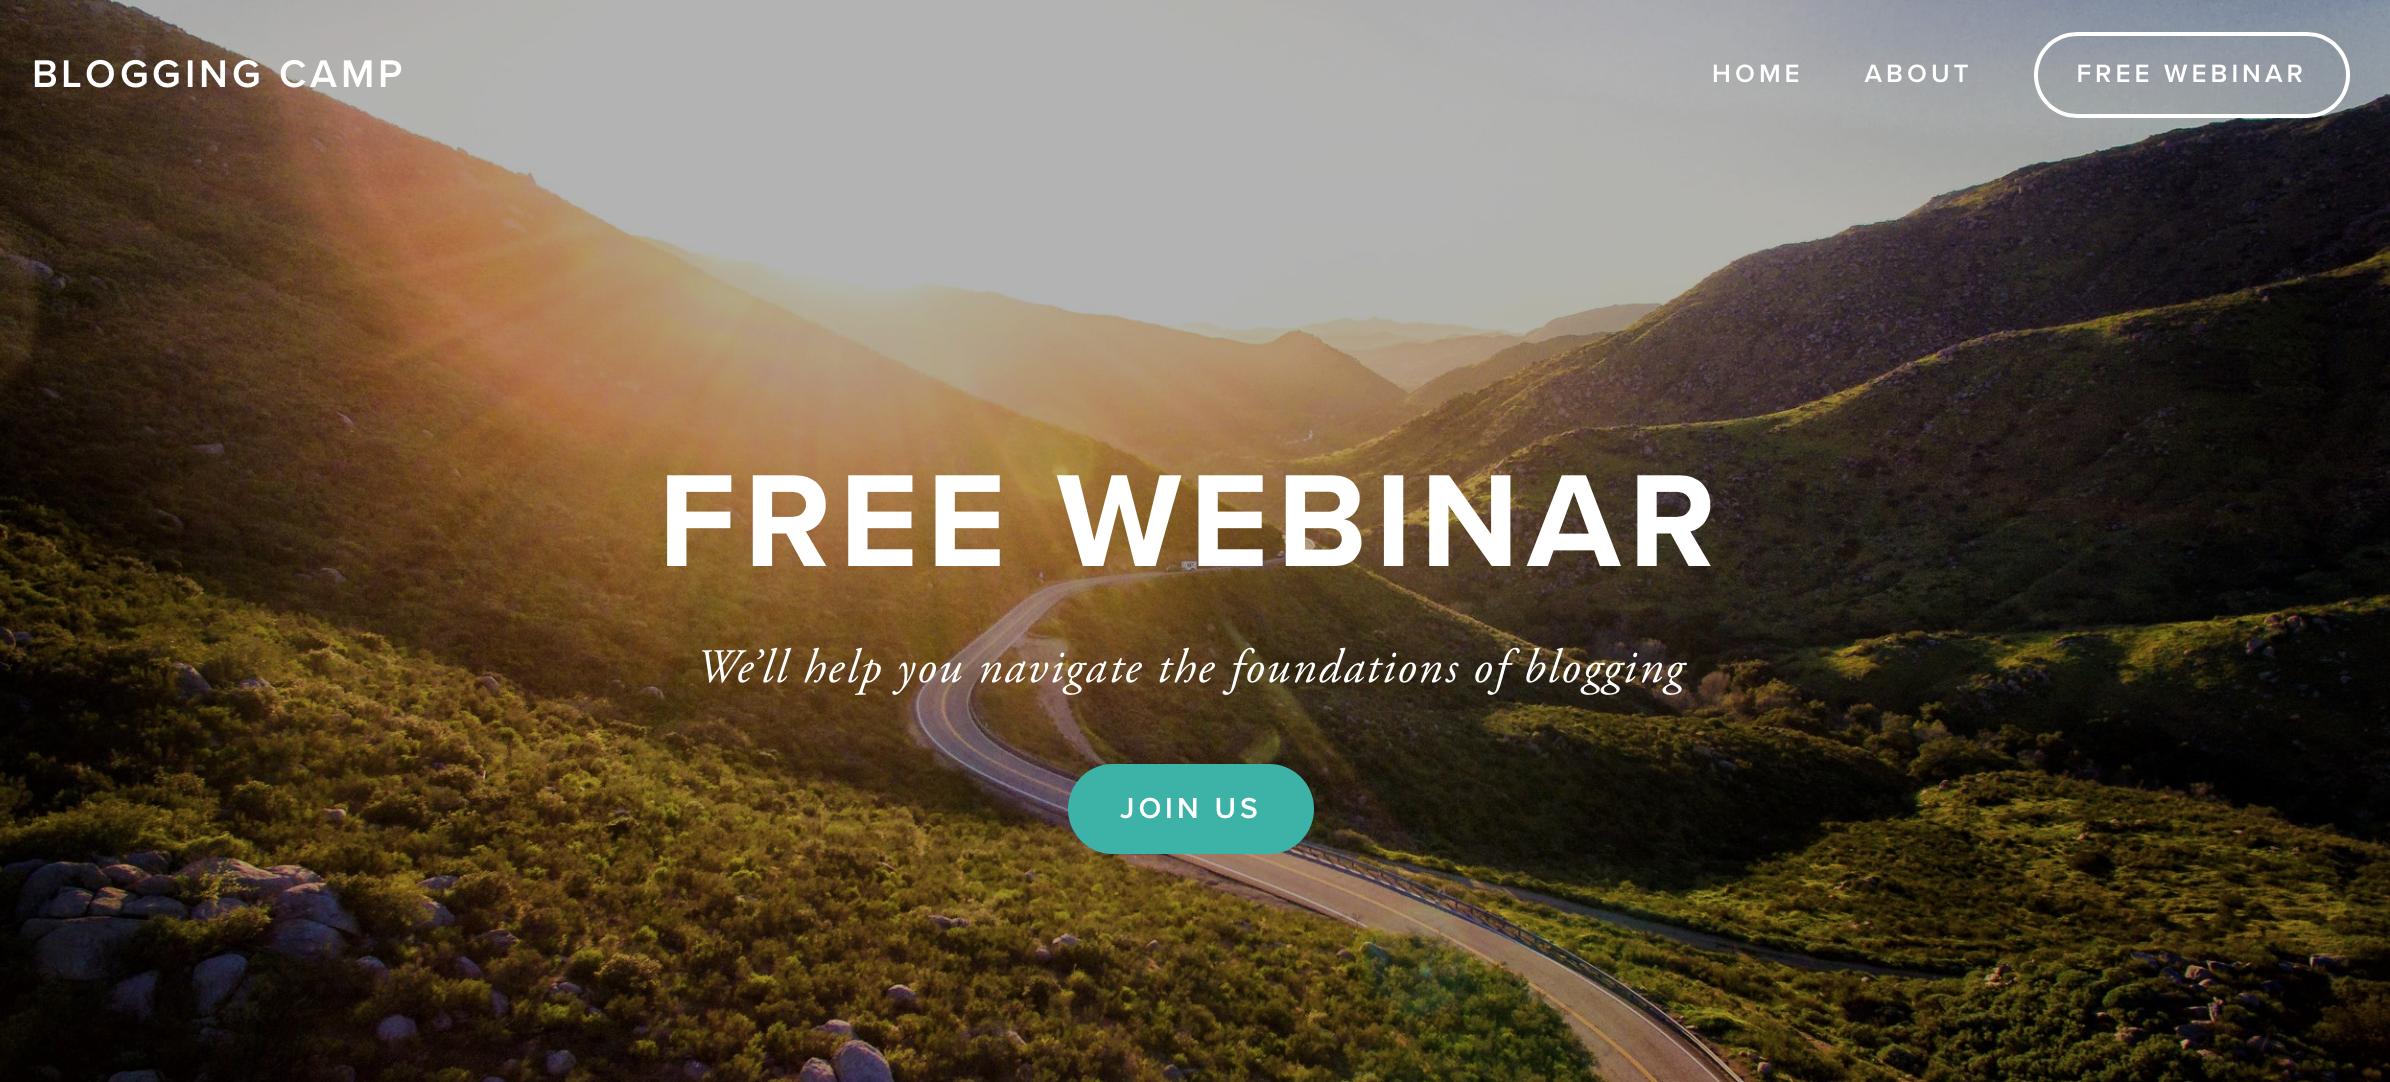 Blogging For Business Free Webinar